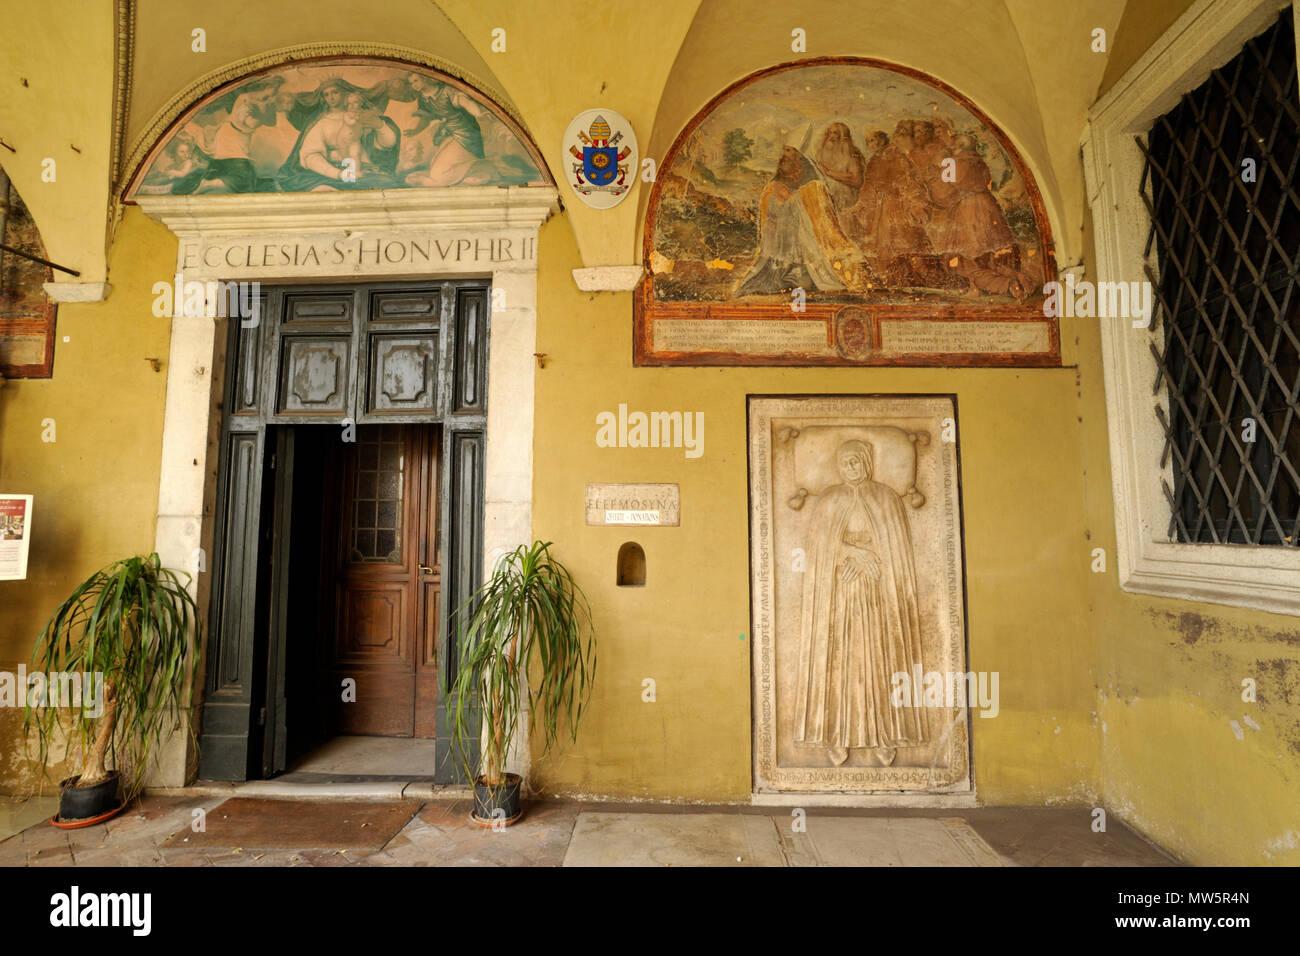 italy, rome, church of sant'onofrio al gianicolo, entrance to the church Stock Photo